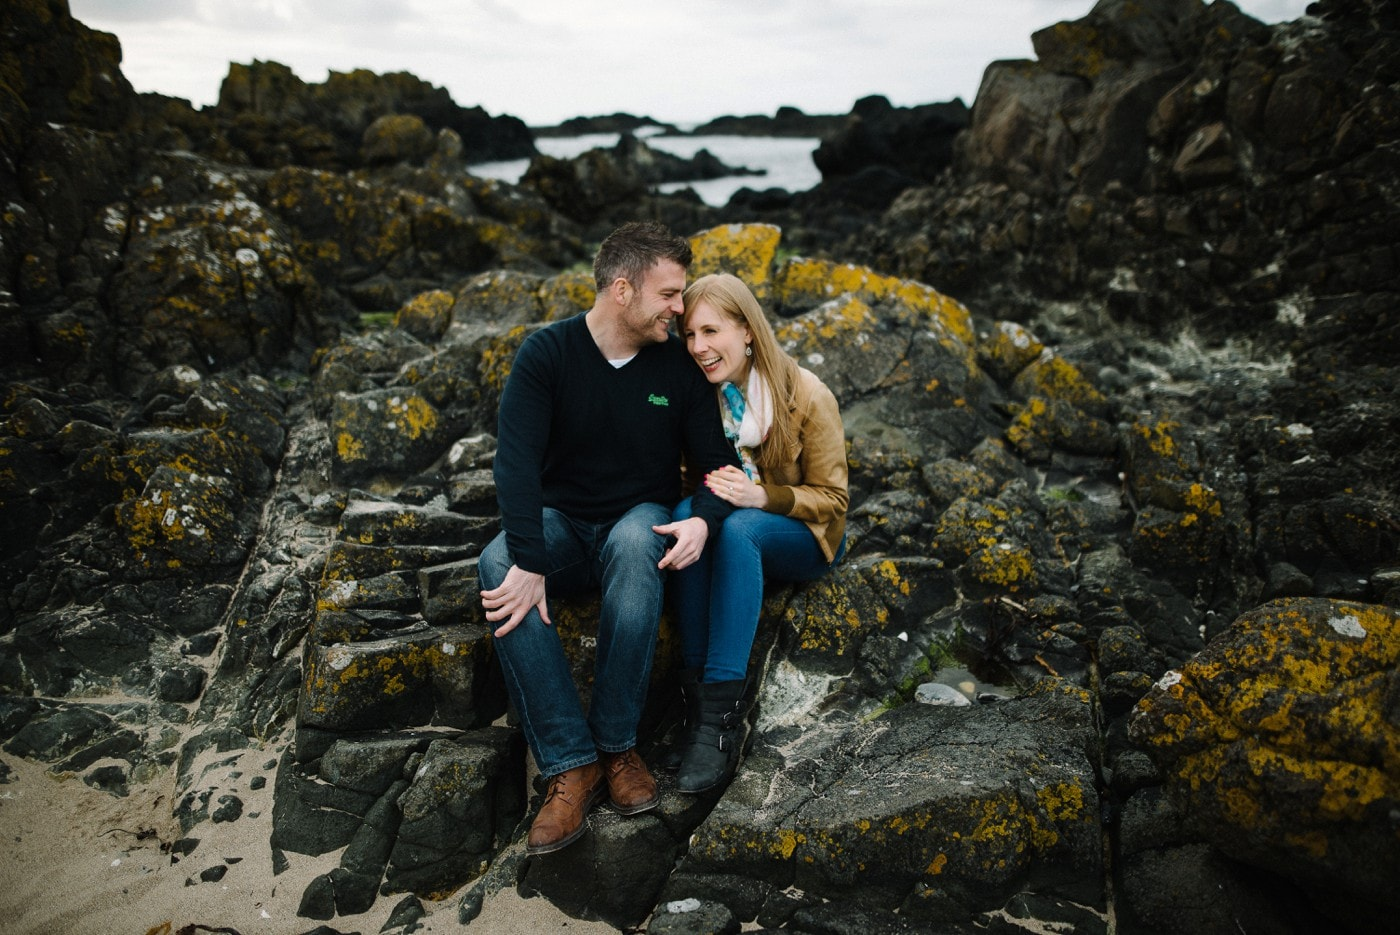 ballintoy-harbour-engagement-wedding-photographer-northern-ireland_0003